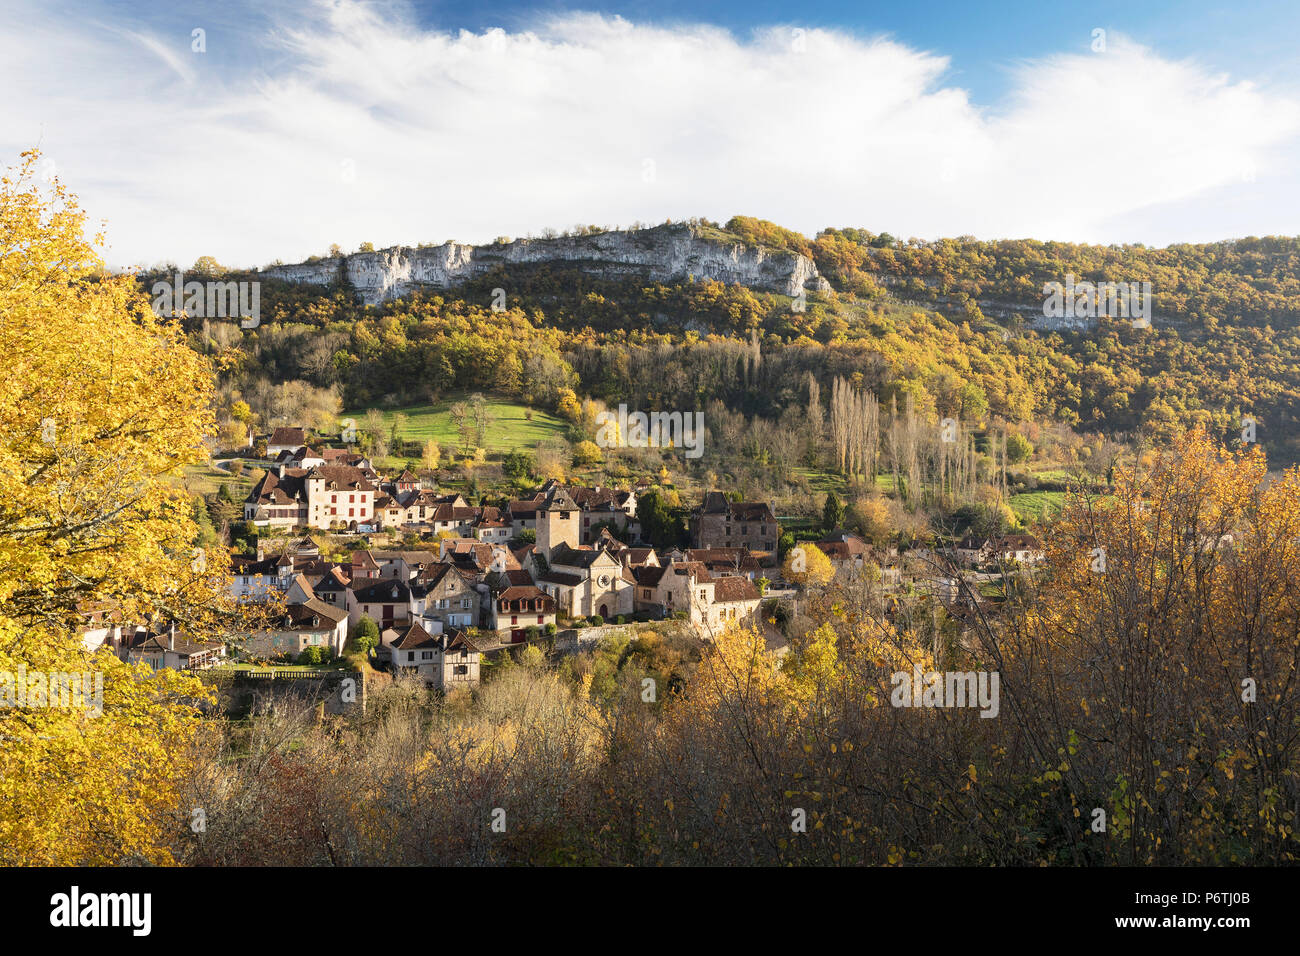 Das Dorf Autoire im Herbst, Lot, Midi-Pyrénées, Frankreich Stockbild